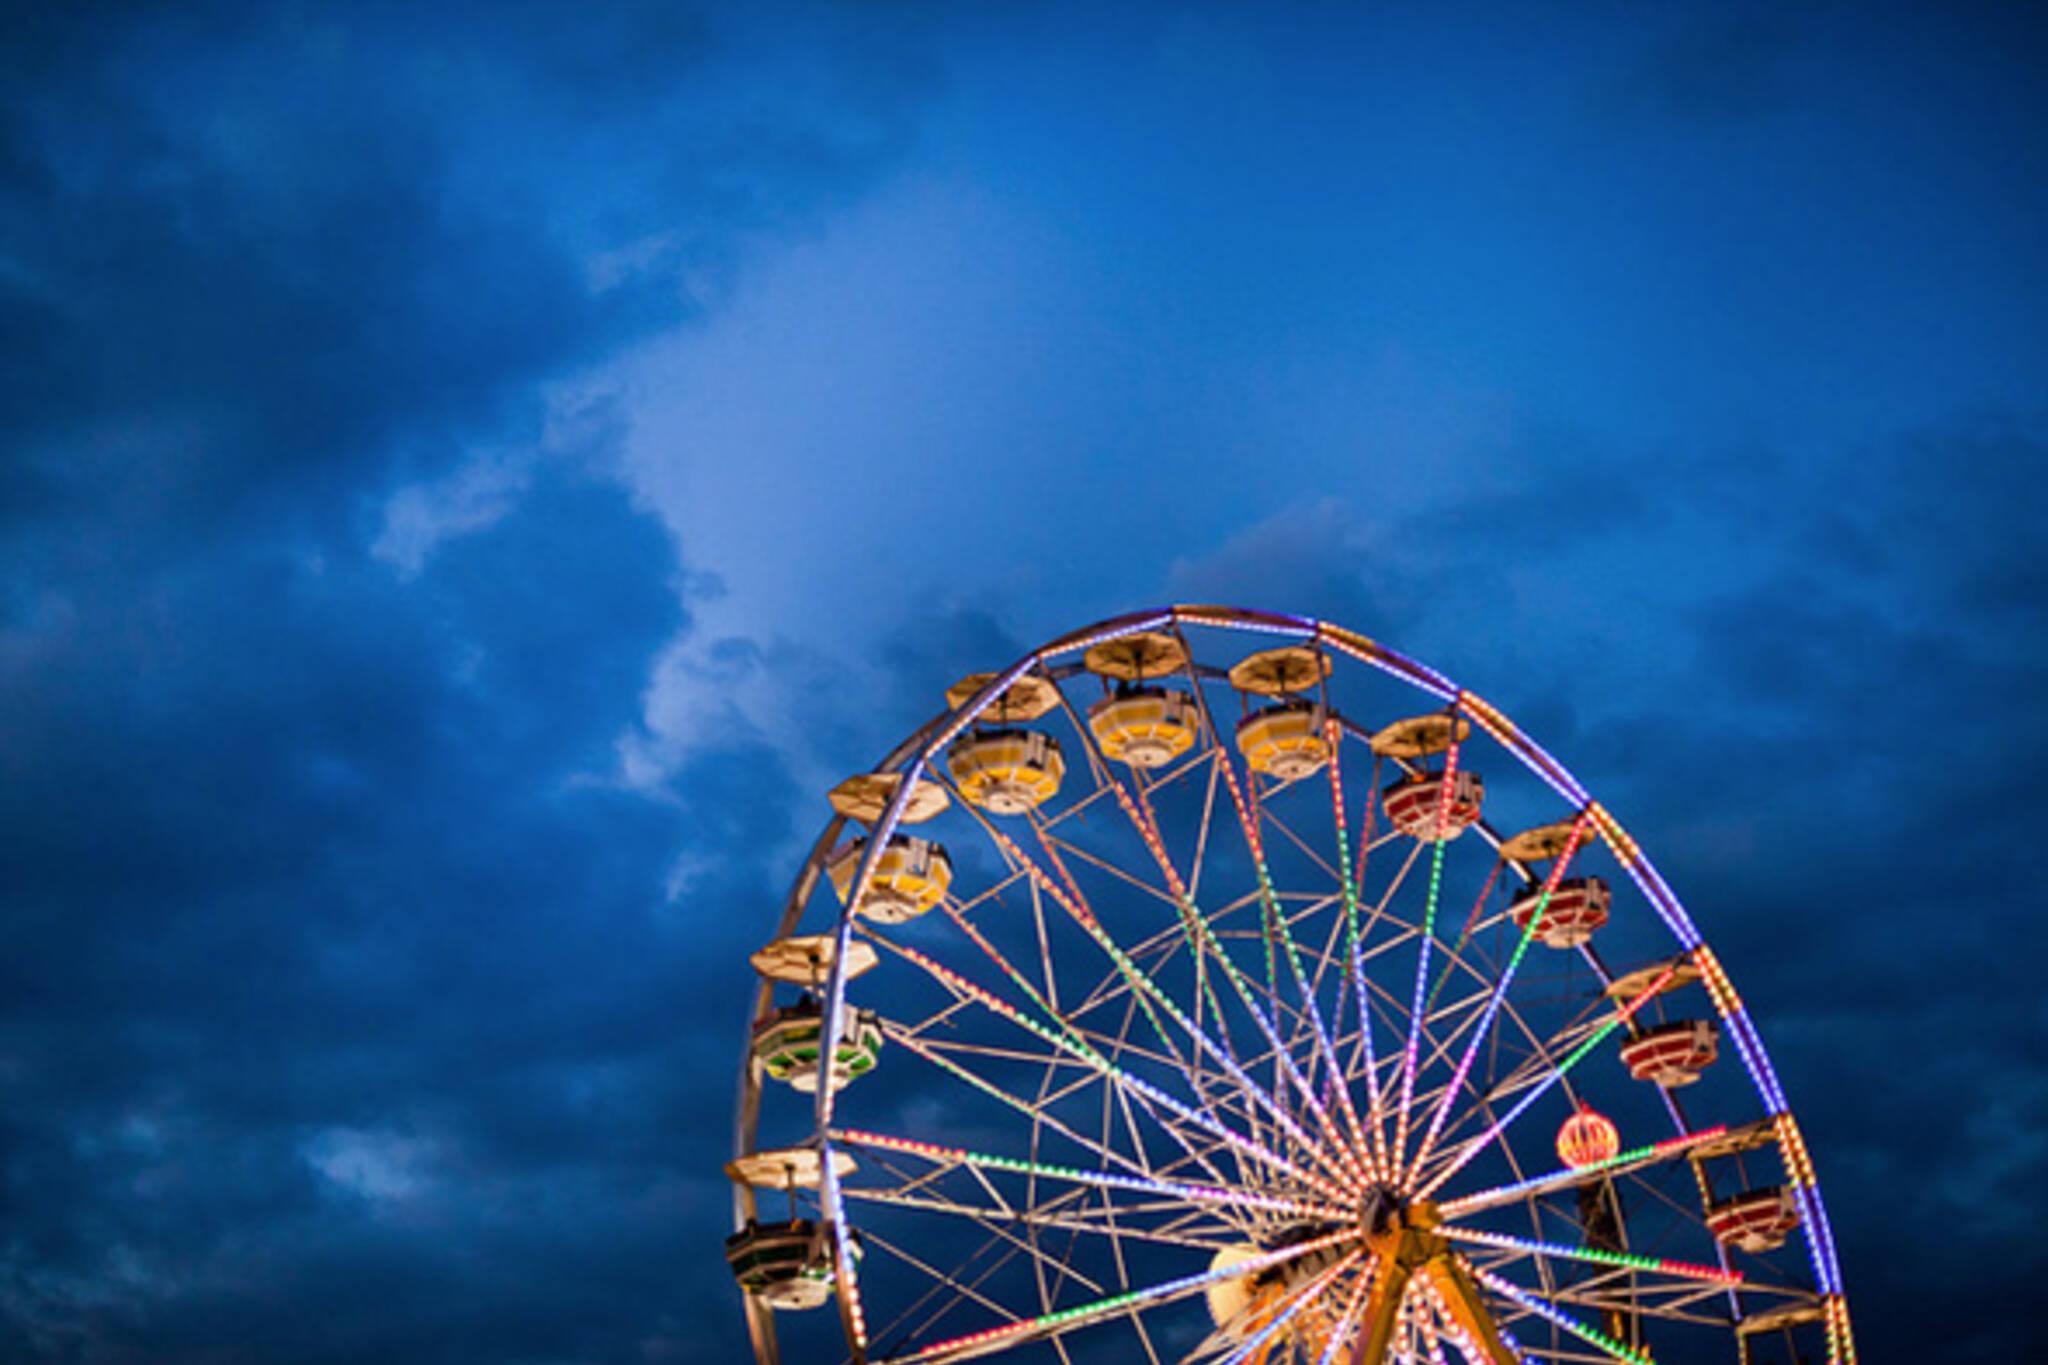 Ferris Wheel Toronto